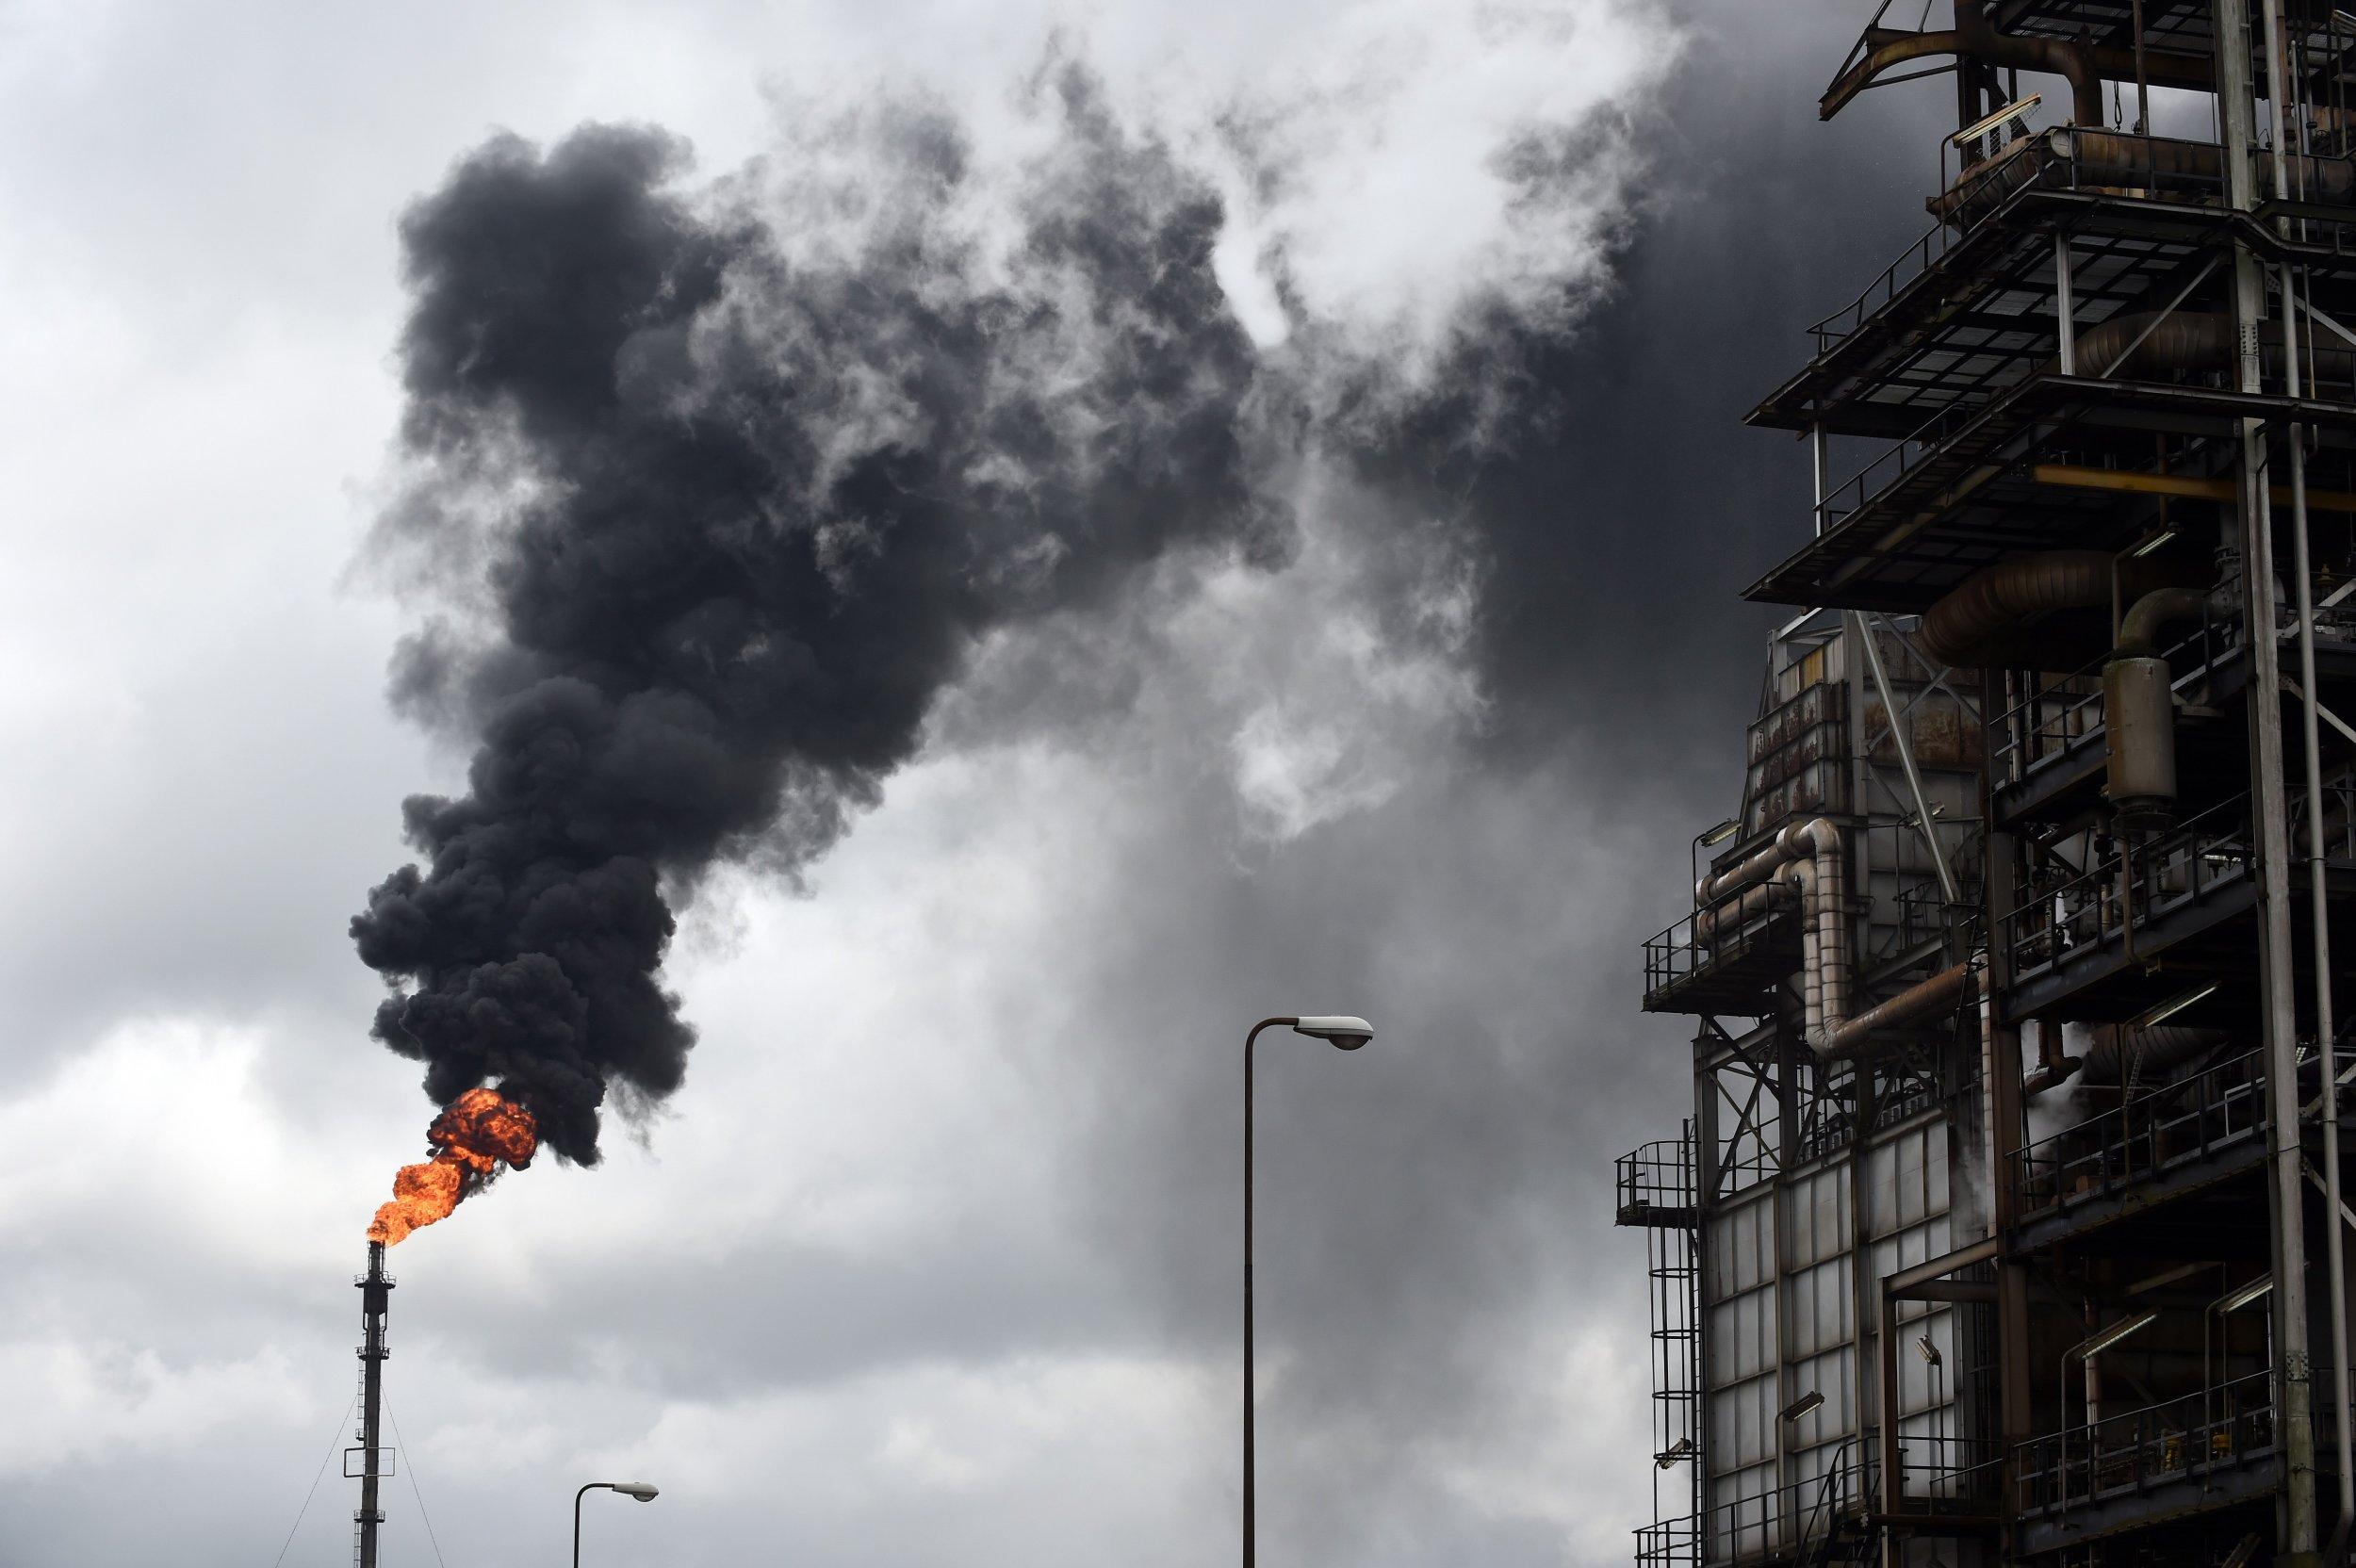 Niger Delta oil refinery.